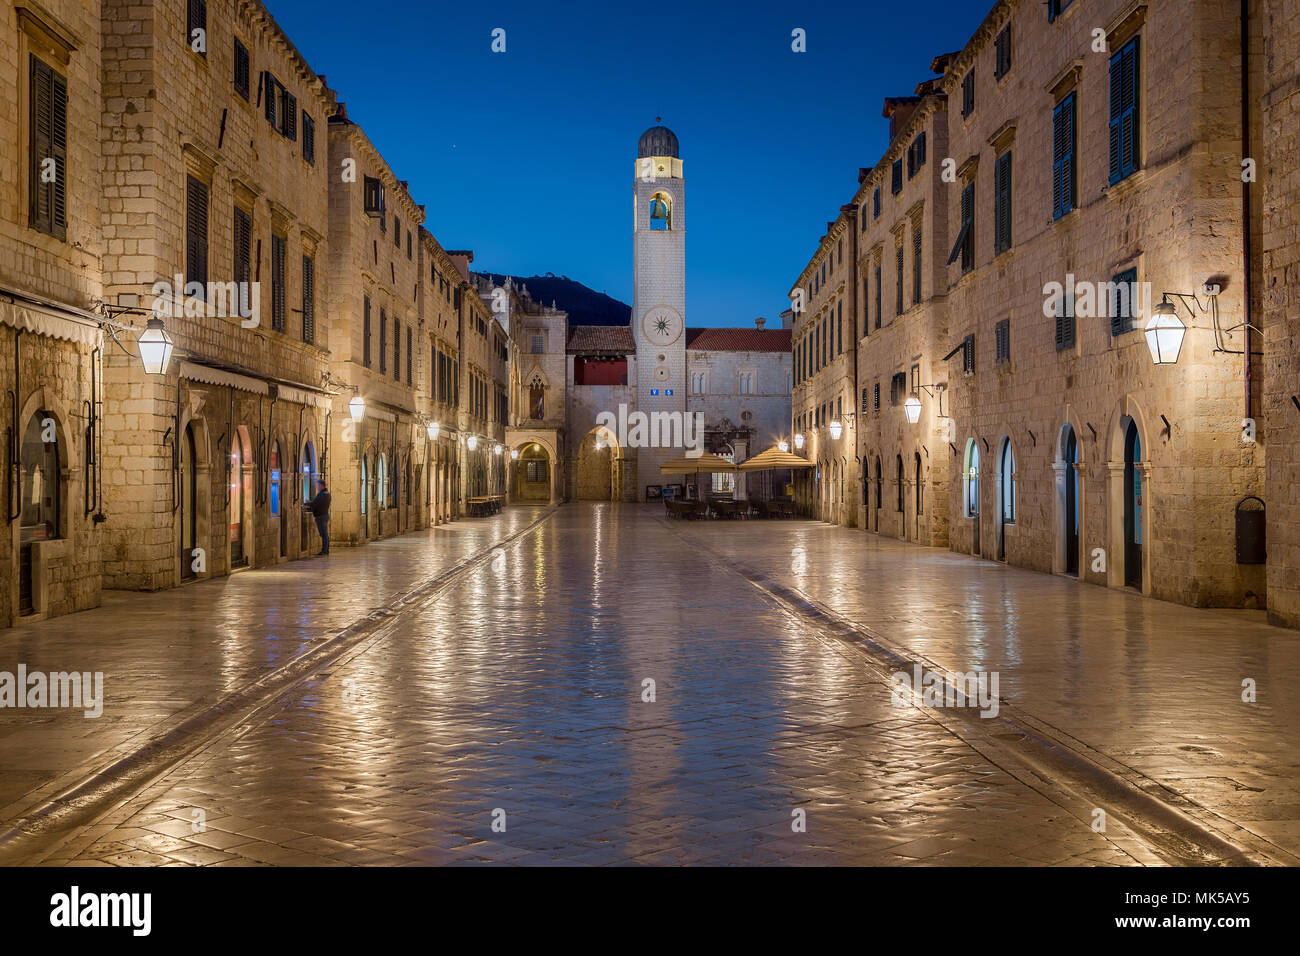 Klassische Panoramablick auf den berühmten Stradun, die Hauptstraße der Altstadt von Dubrovnik, in schöner Morgendämmerung vor Sonnenaufgang in der Morgendämmerung im Sommer Stockbild